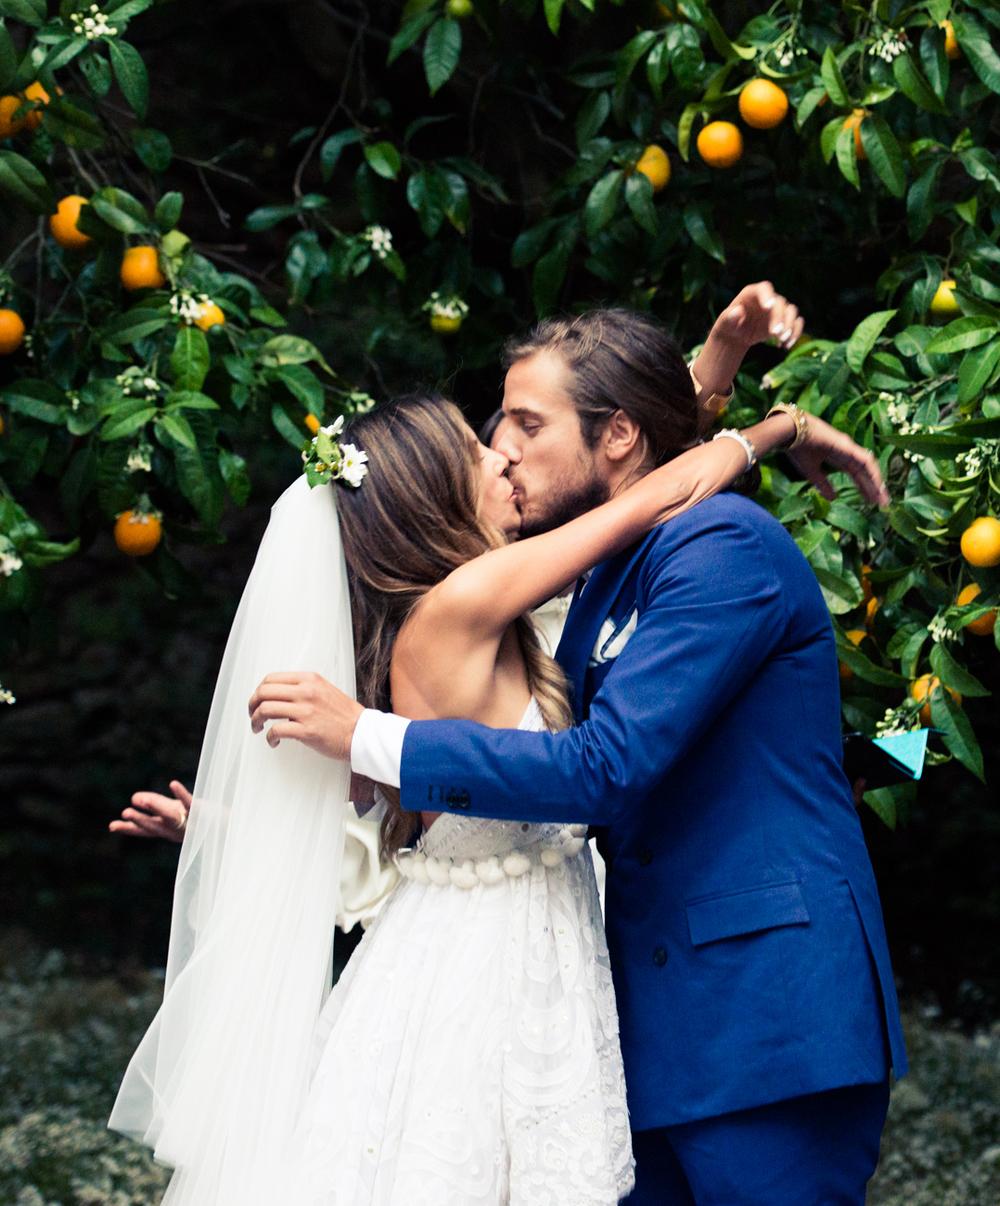 Erica_Pelosini_Wedding_Weekend_The_Wedding-66.jpg